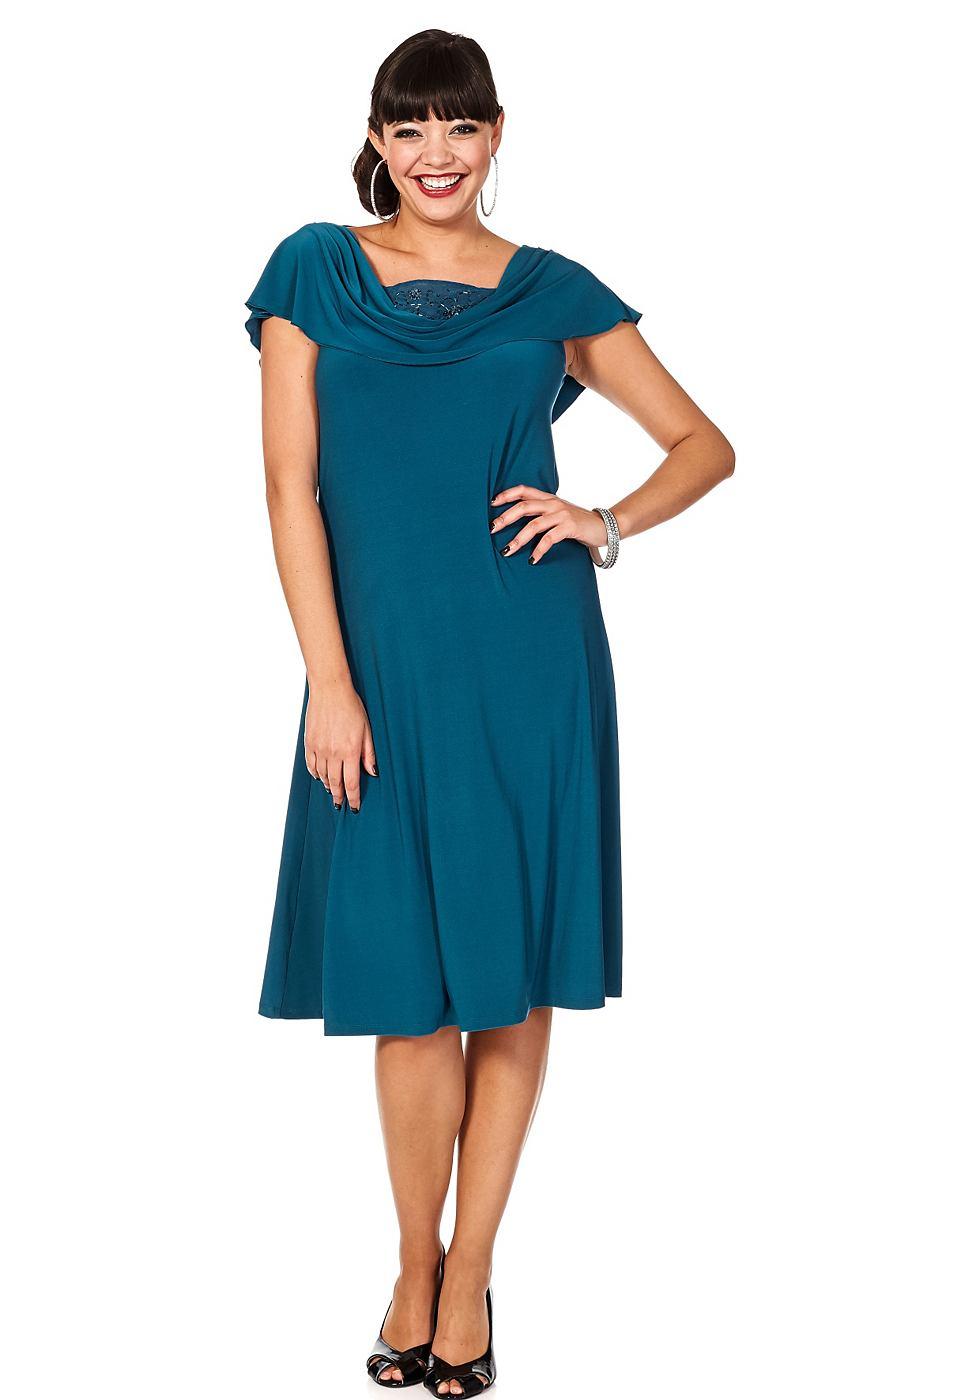 Sheego Style jurk groen